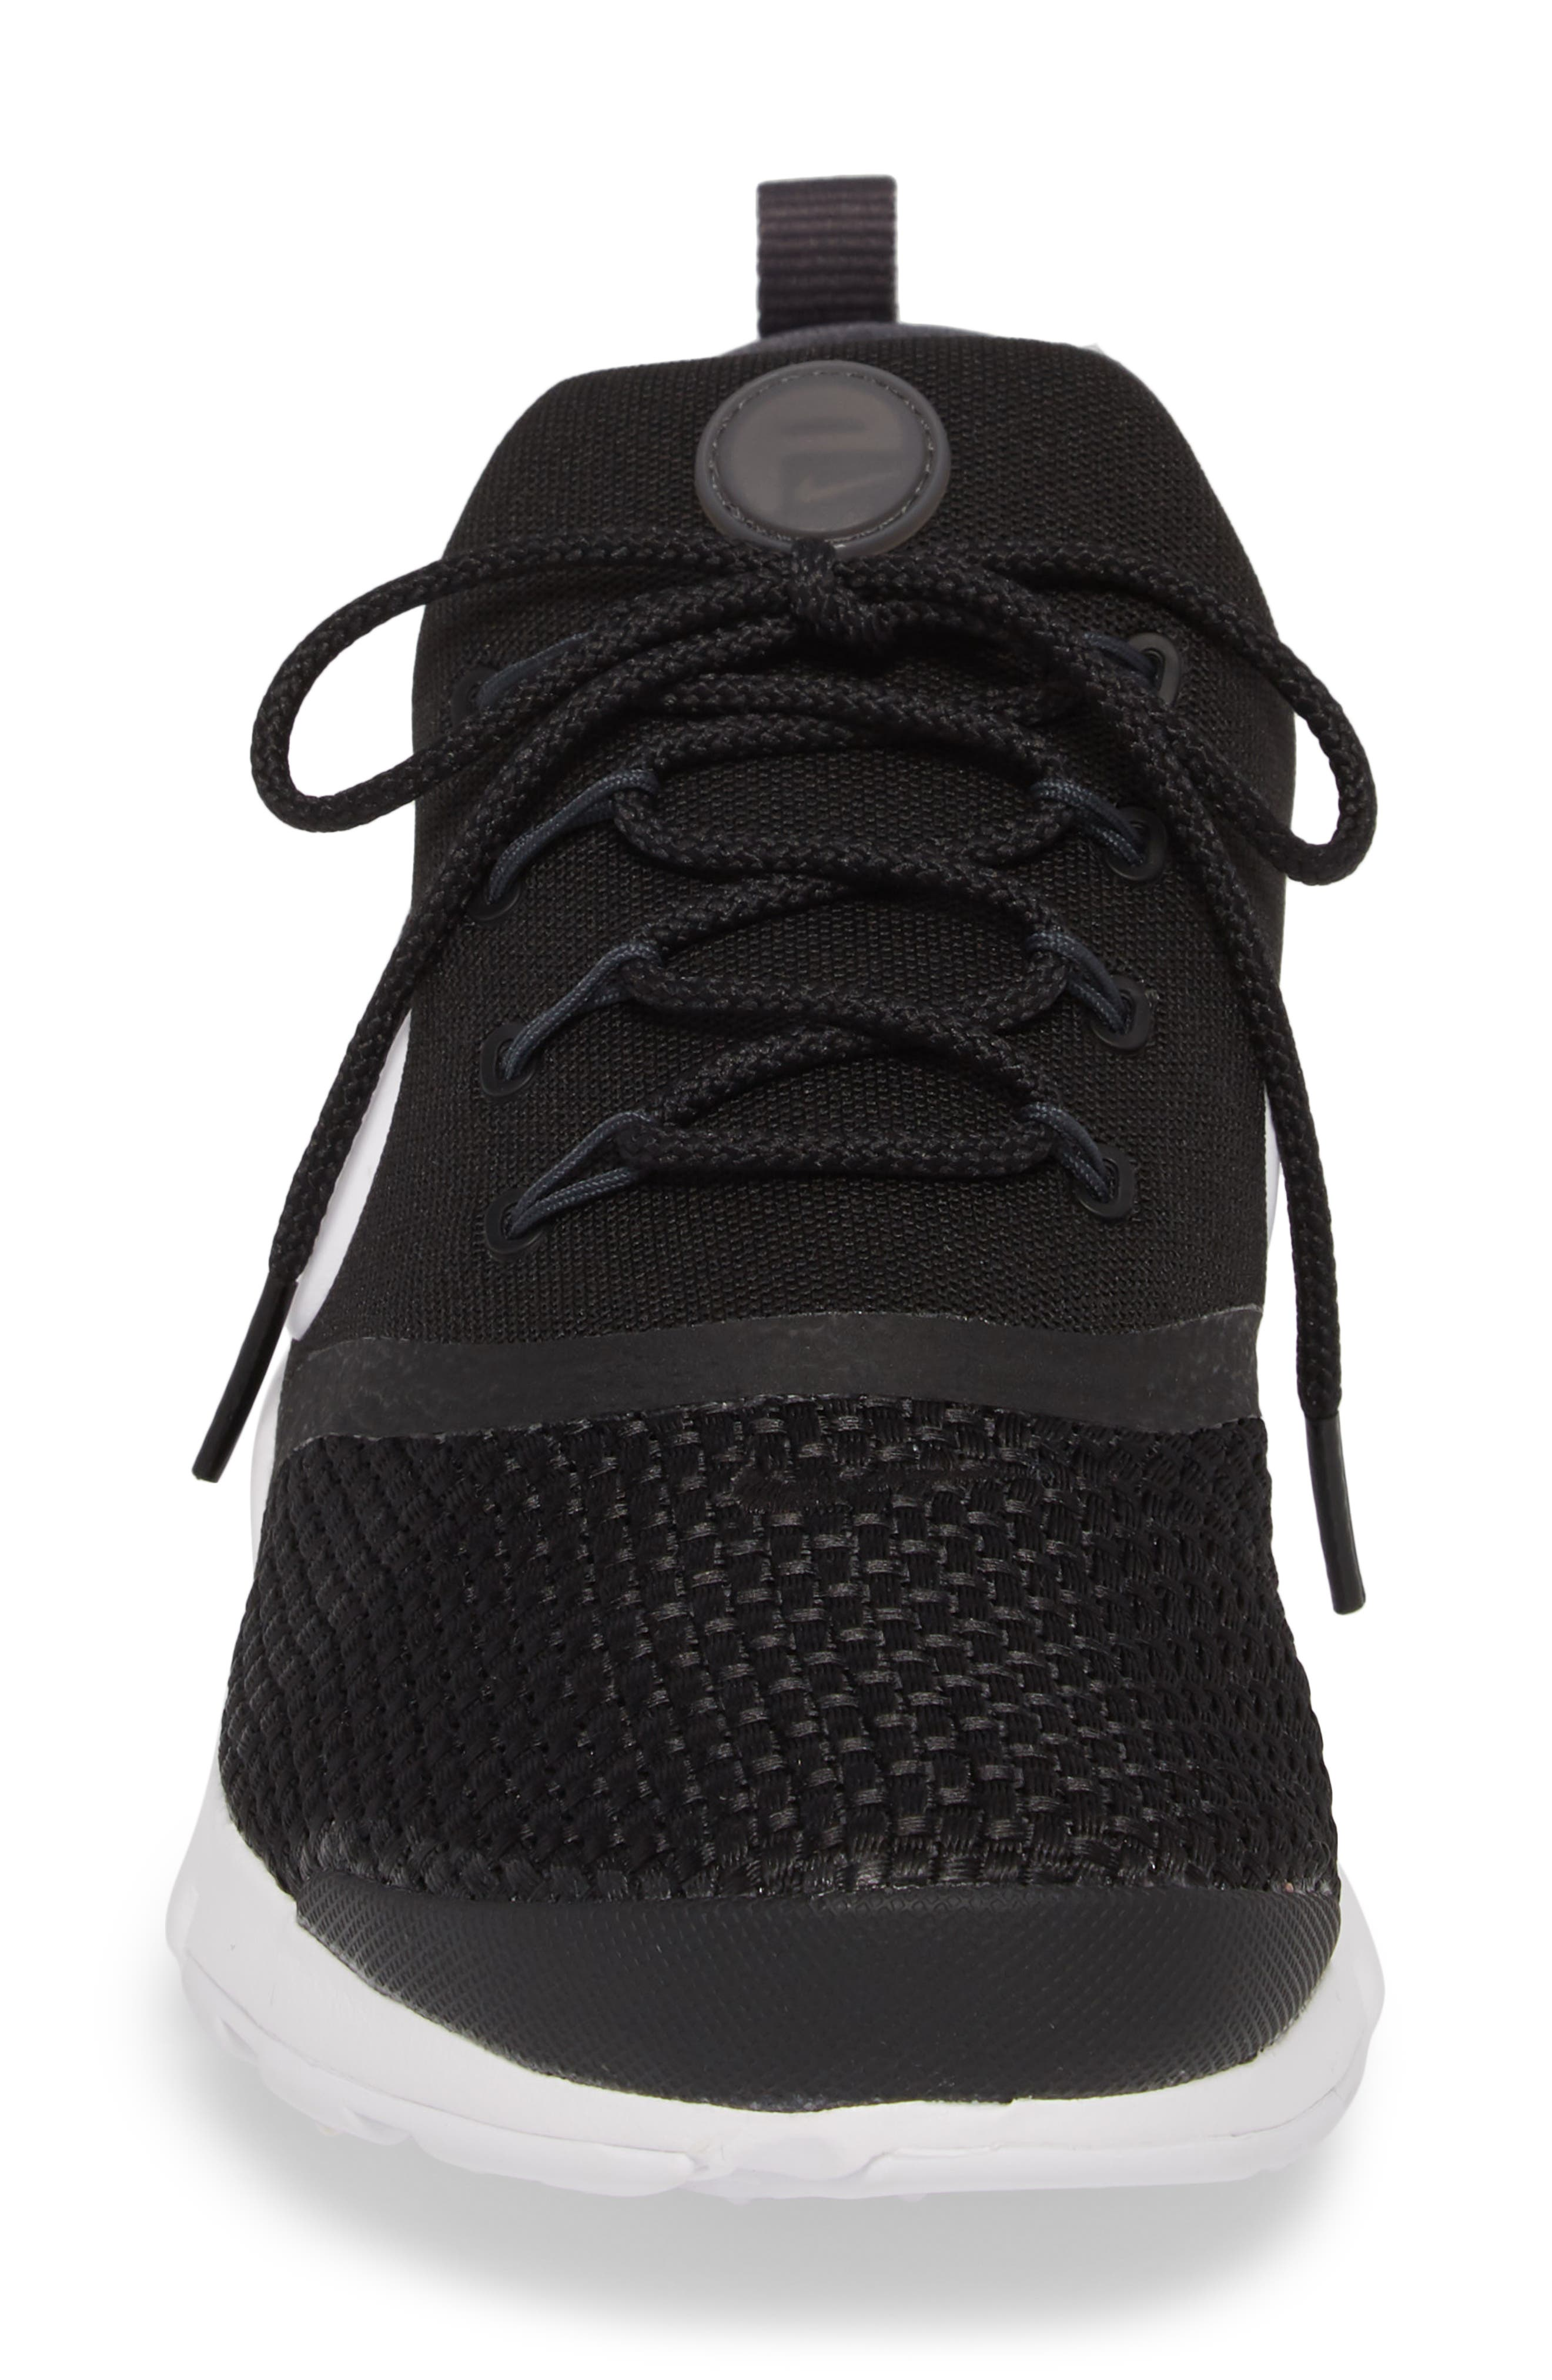 Presto Fly Sneaker,                             Alternate thumbnail 4, color,                             BLACK/ WHITE/ ANTHRACITE